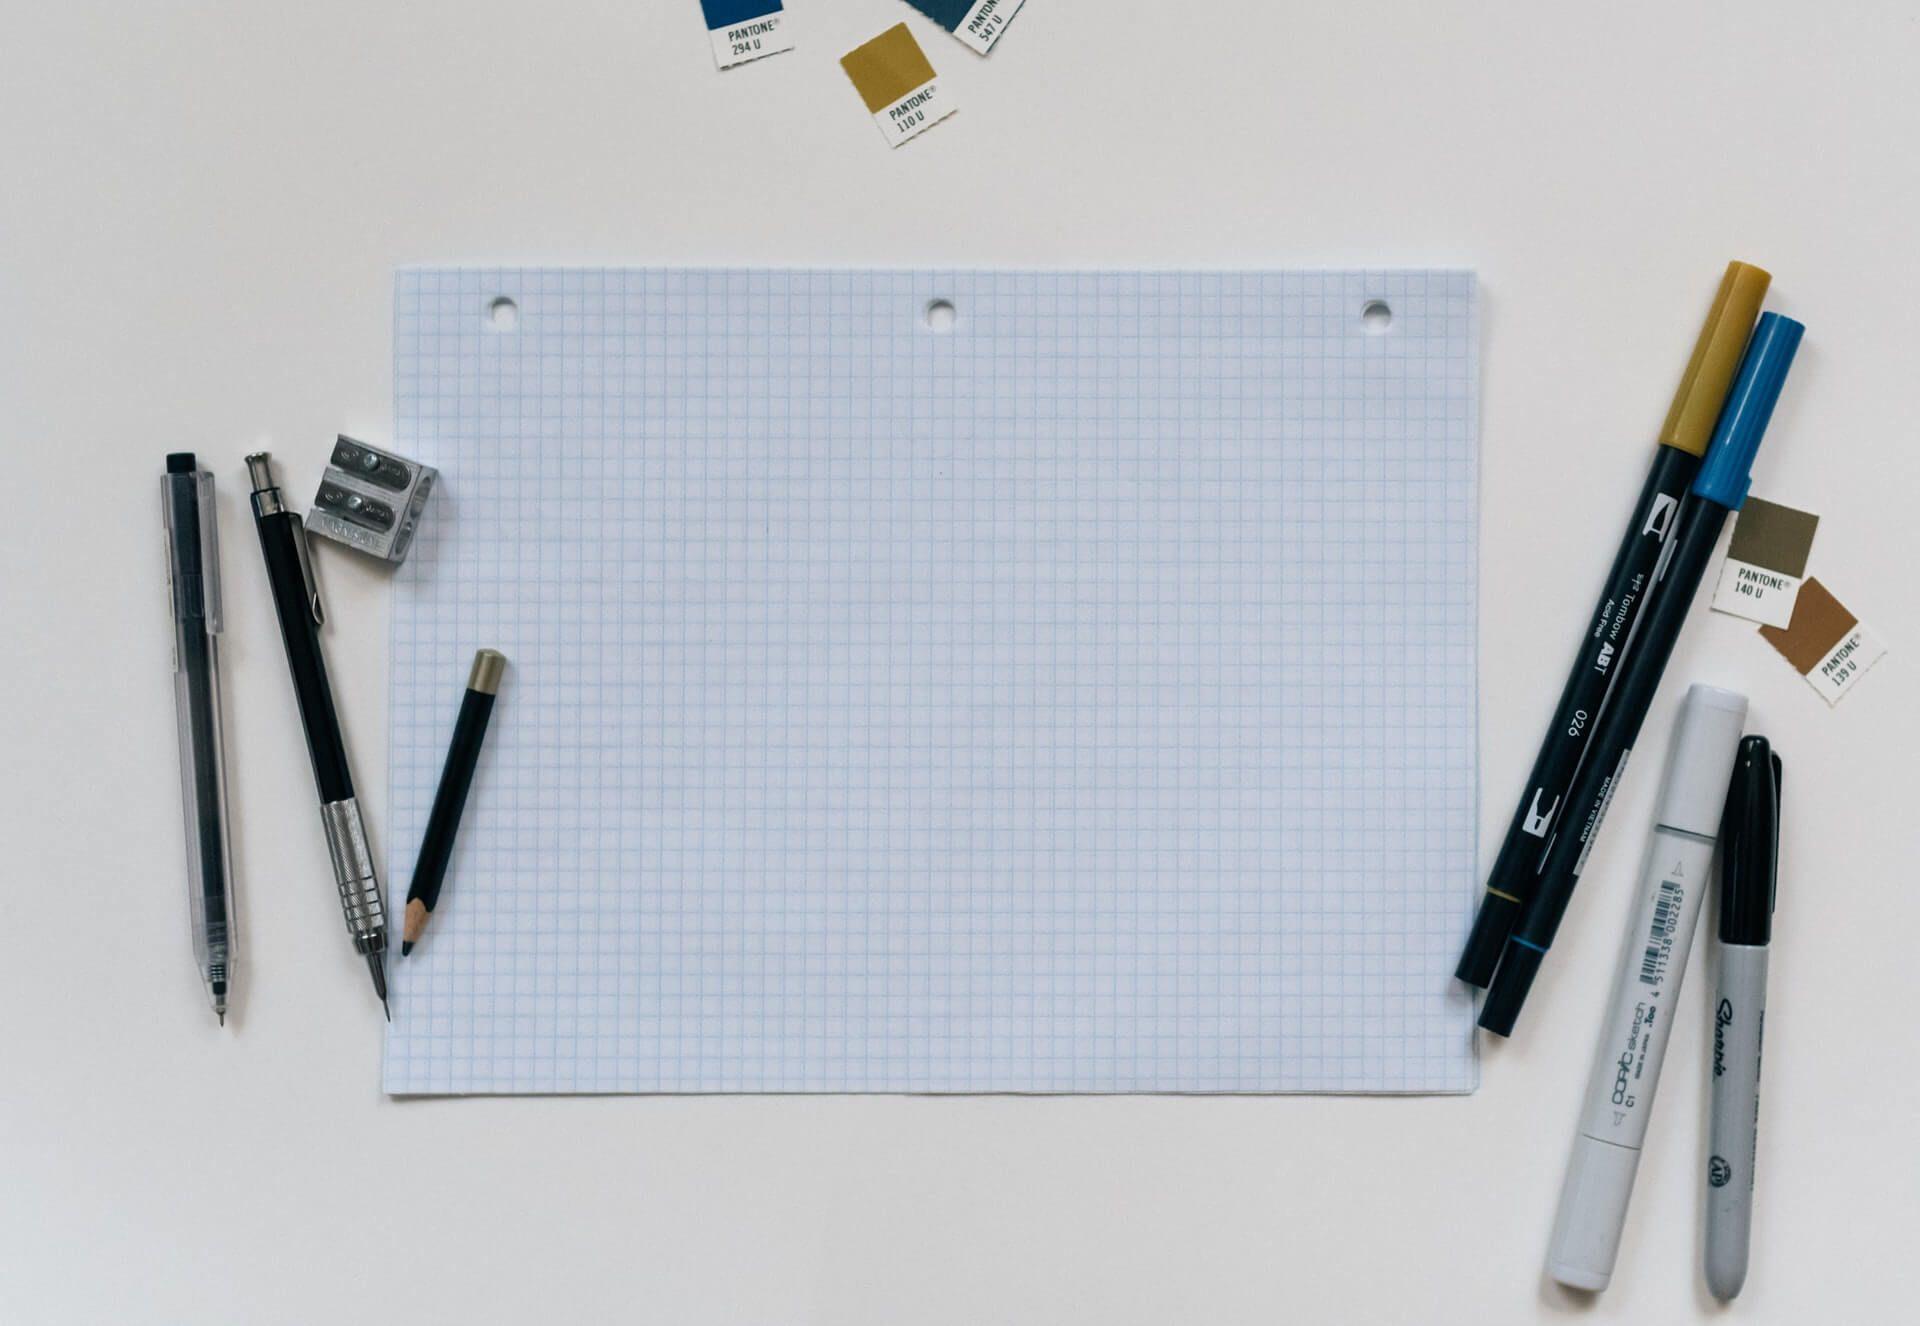 paper, pens and pencils